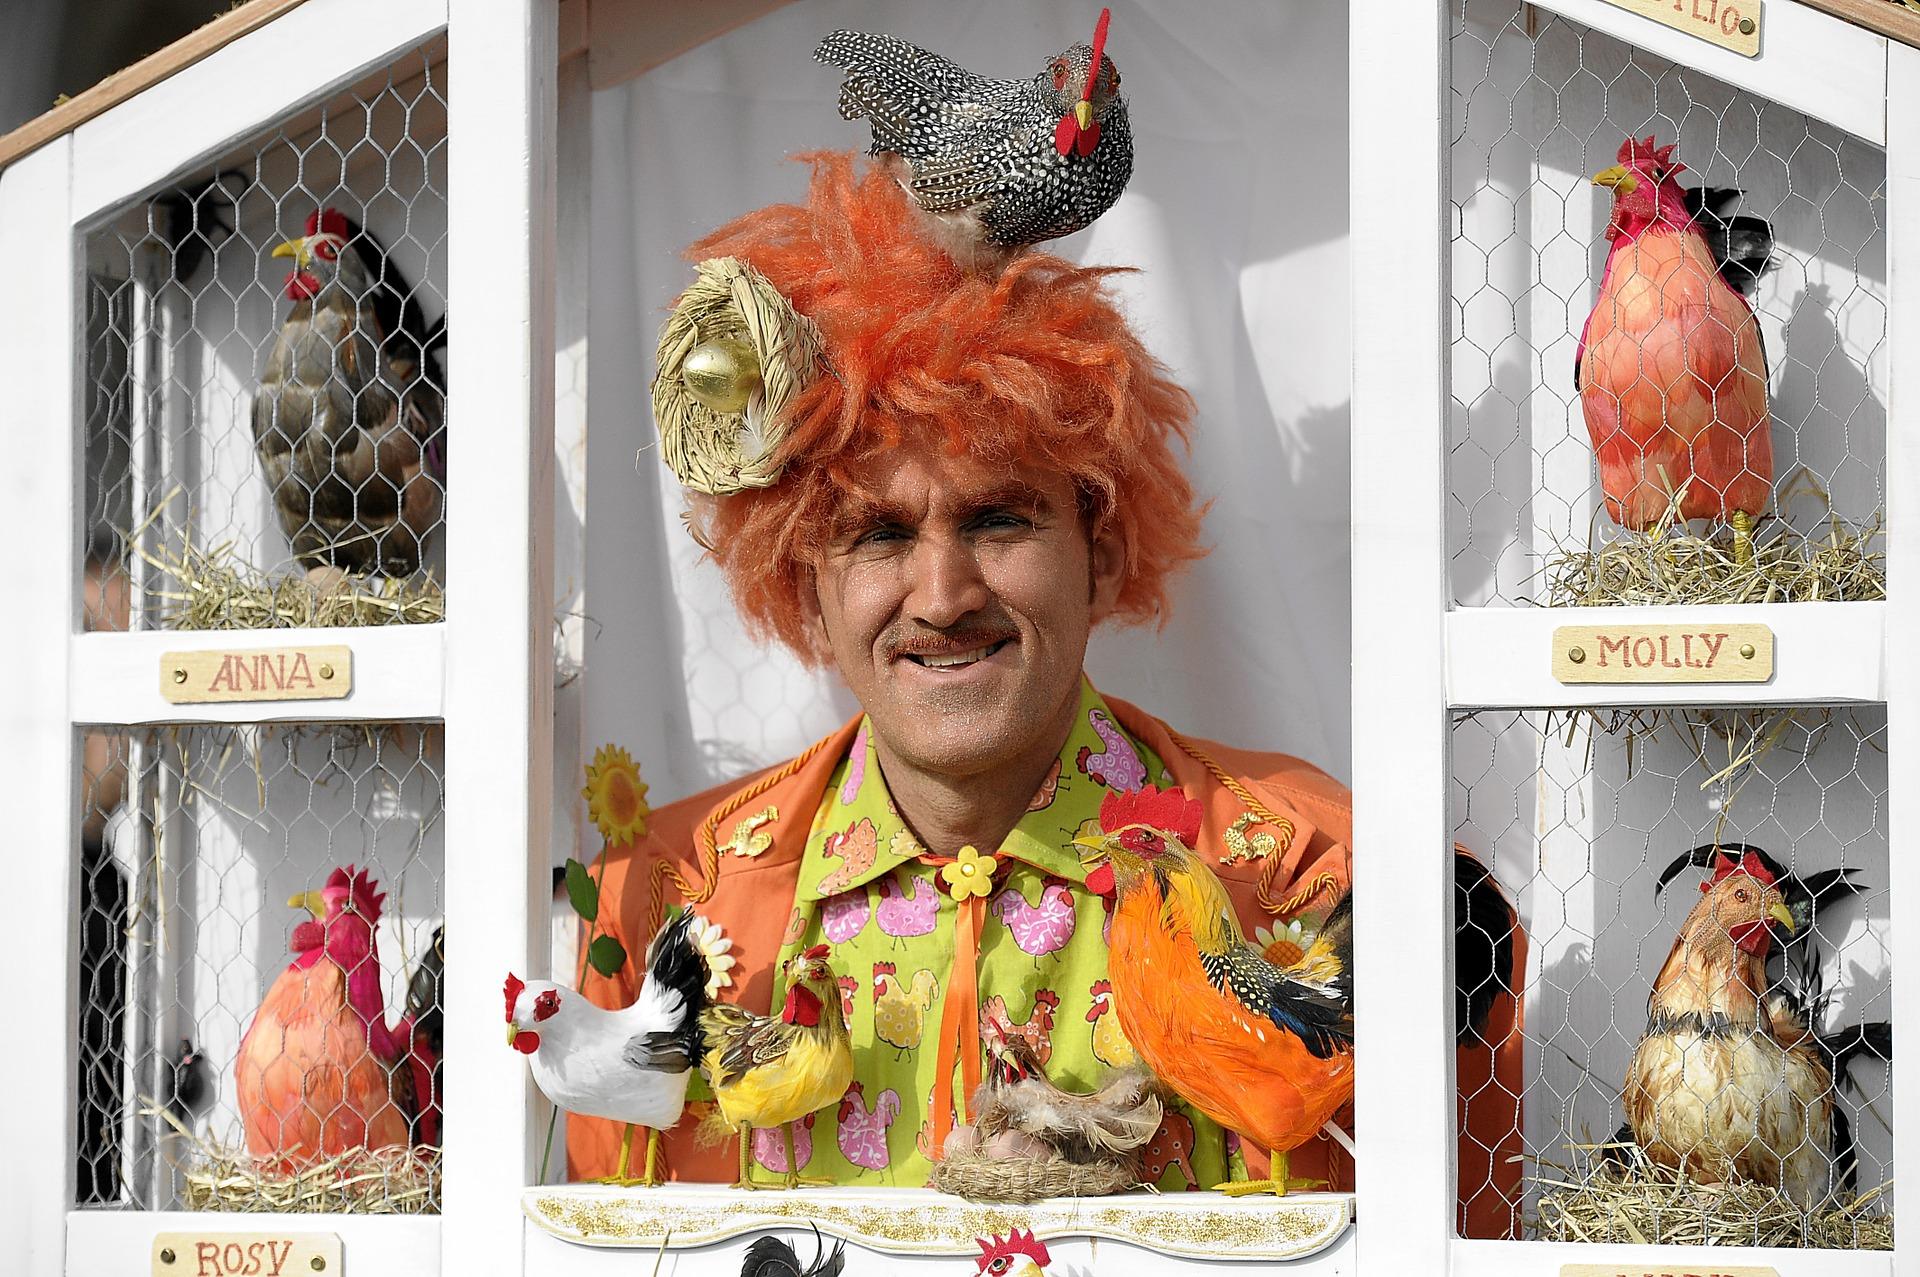 Carnaval de Venecia, Italia carnaval de venecia - 39469480645 e1c7260a91 o - Carnaval de Venecia : la historia y elegancia toman la calle